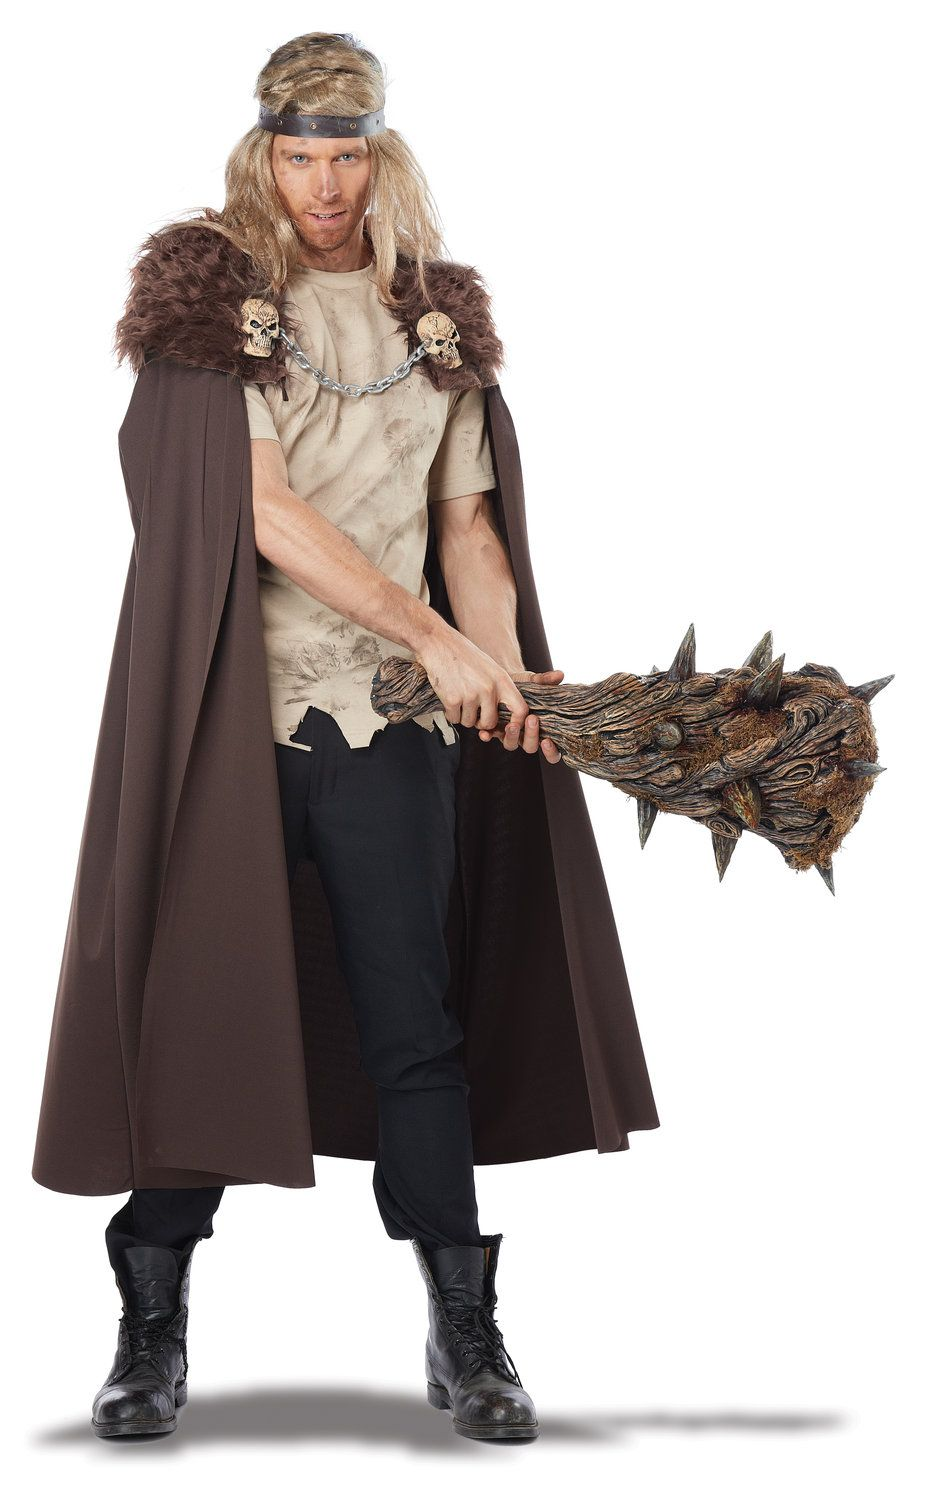 warlord cape menu0027s halloween costume idea